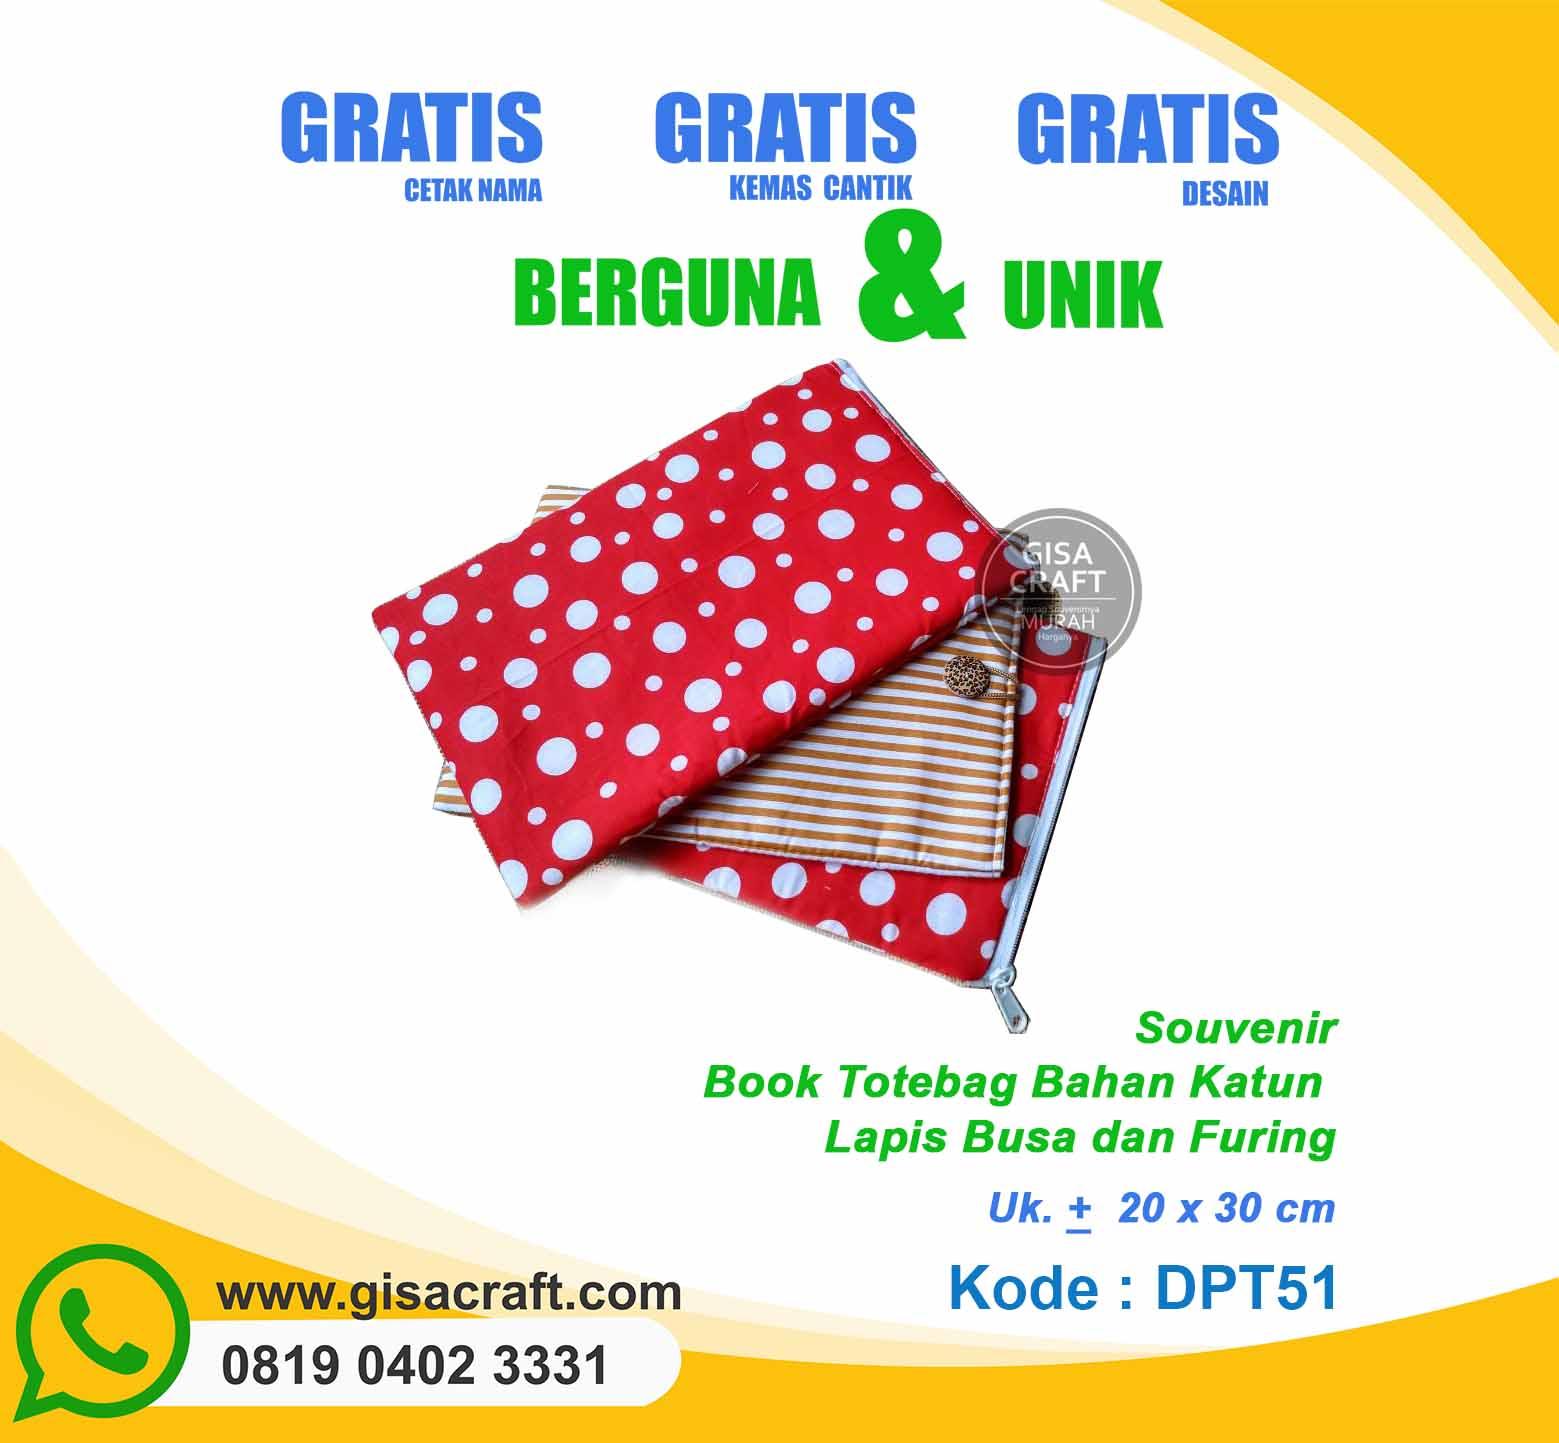 Souvenir Book Totebag Bahan Katun Lapis Busa dan Furing DPT51